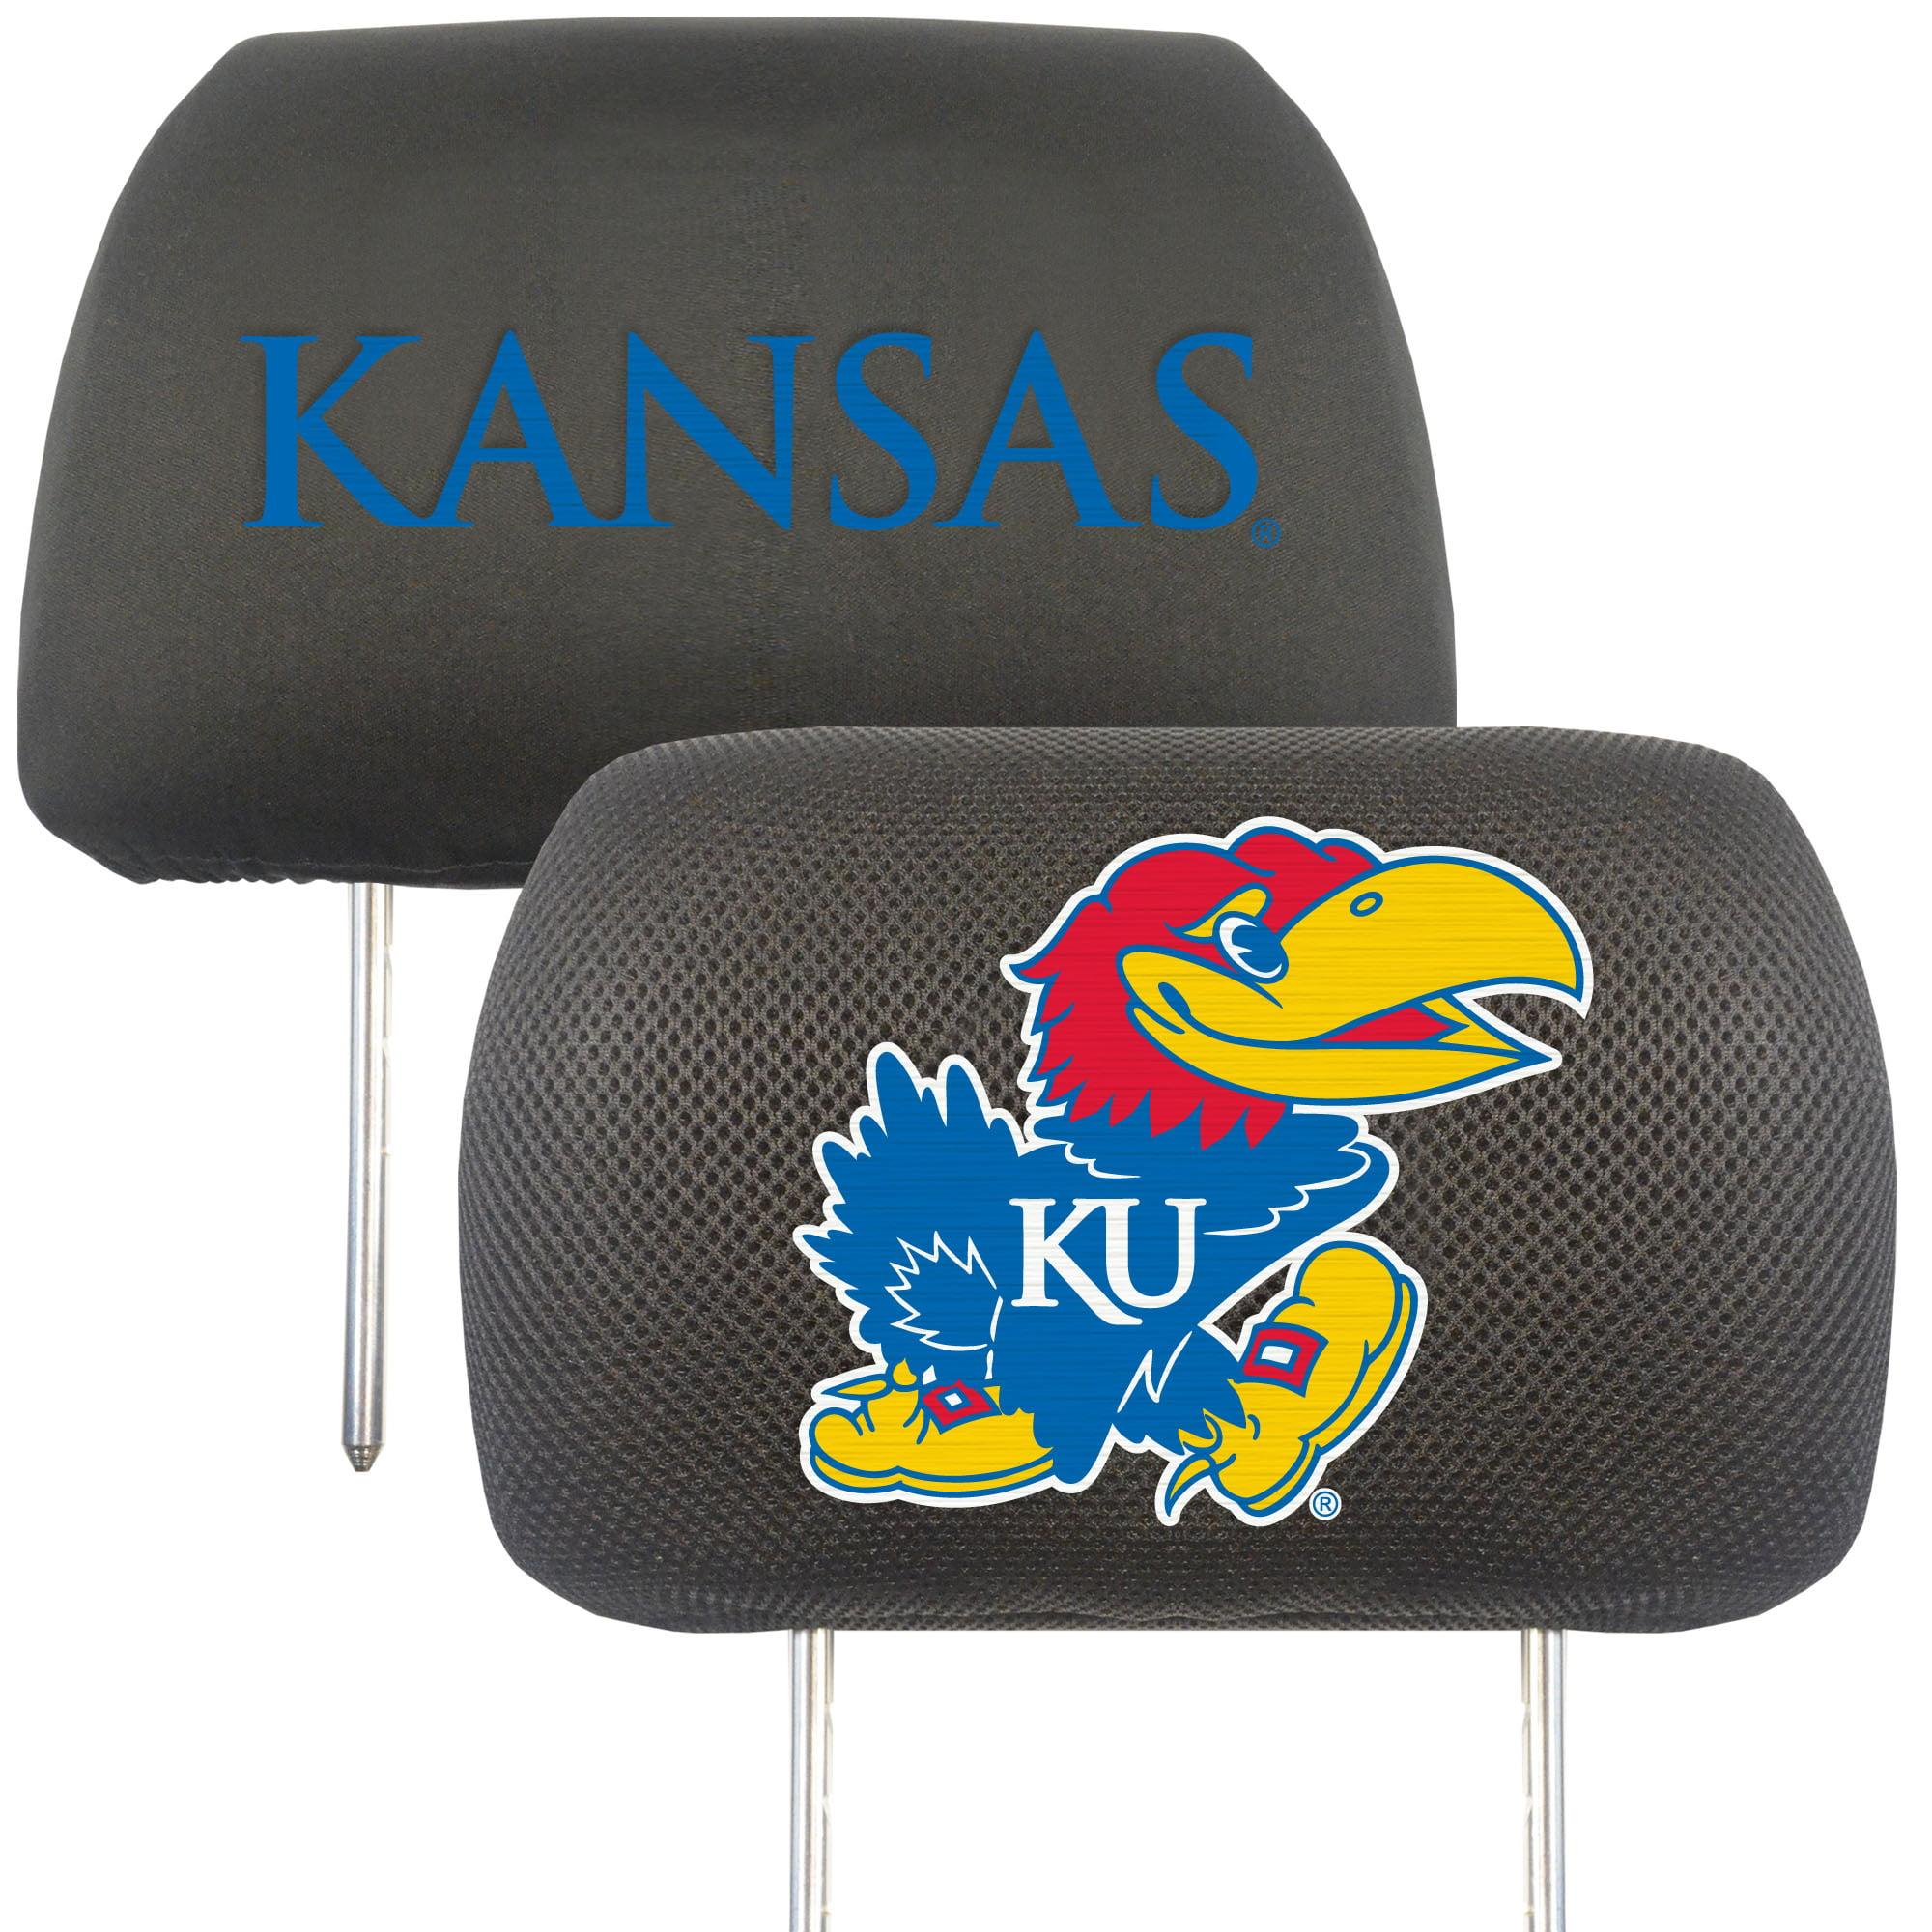 NCAA University of Kansas Jayhawks Head Rest Cover Automotive Accessory